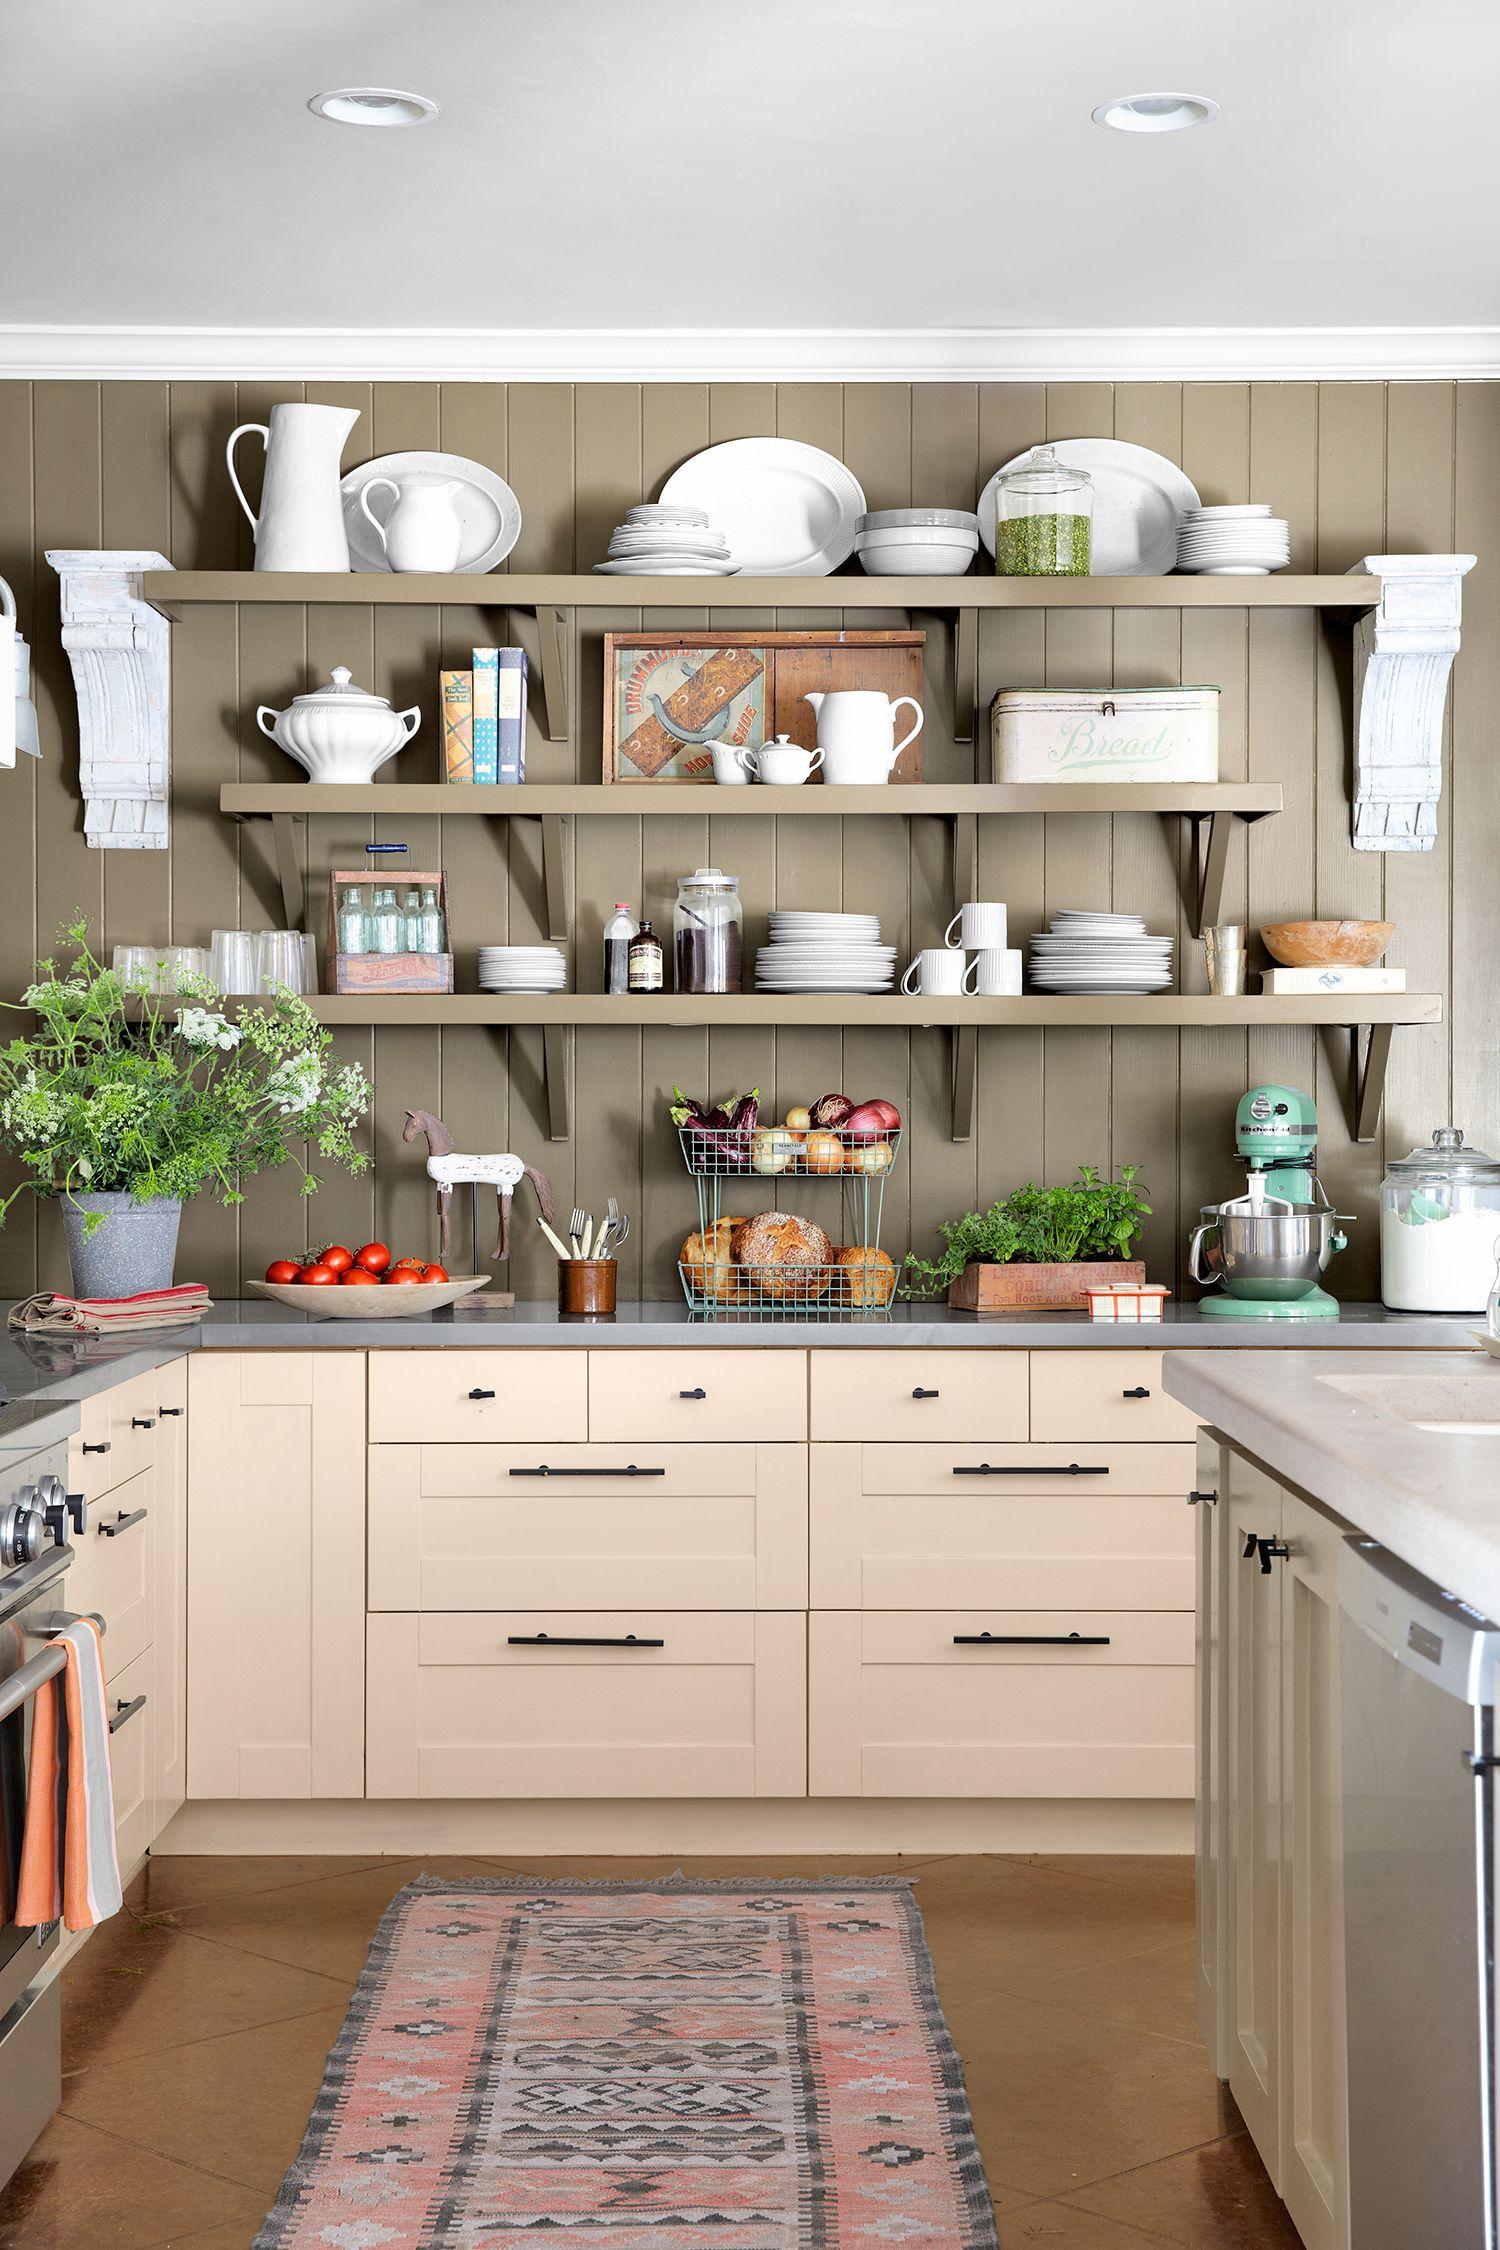 12 Best Kitchen Ideas - Decor and Decorating Ideas for Kitchen Design